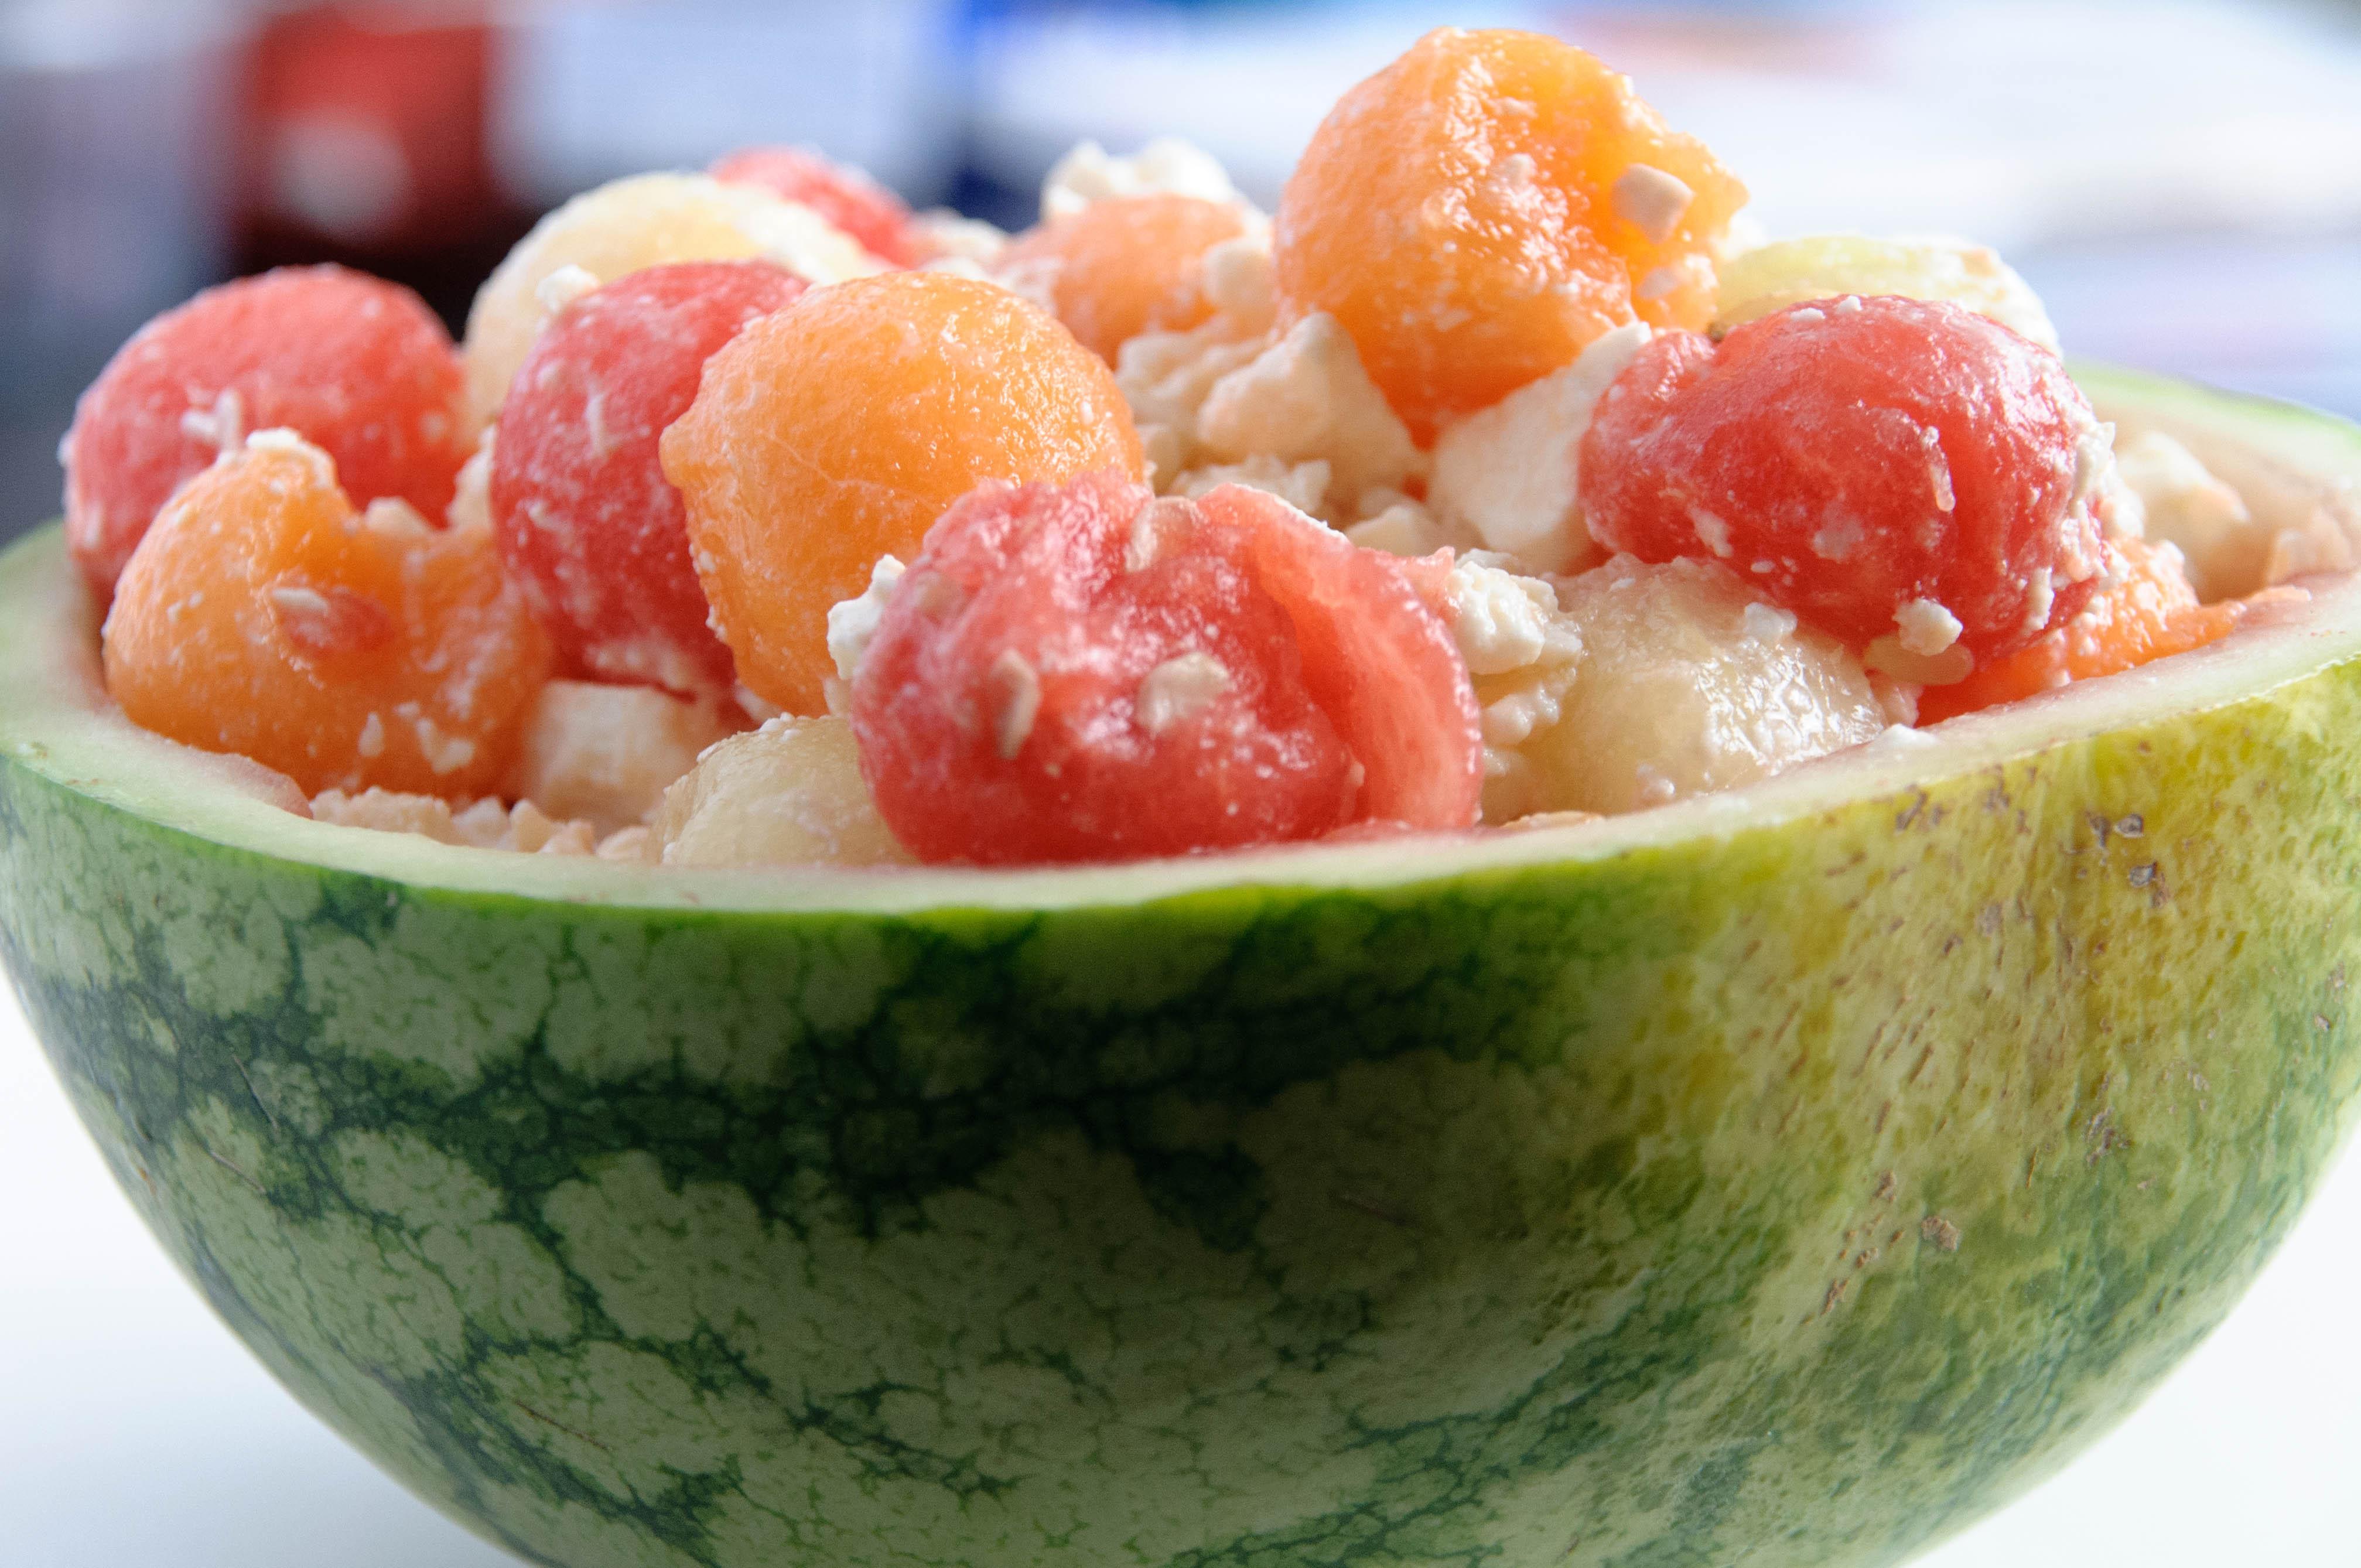 salade de melons et de pastèque à la fêta | les petits plats de